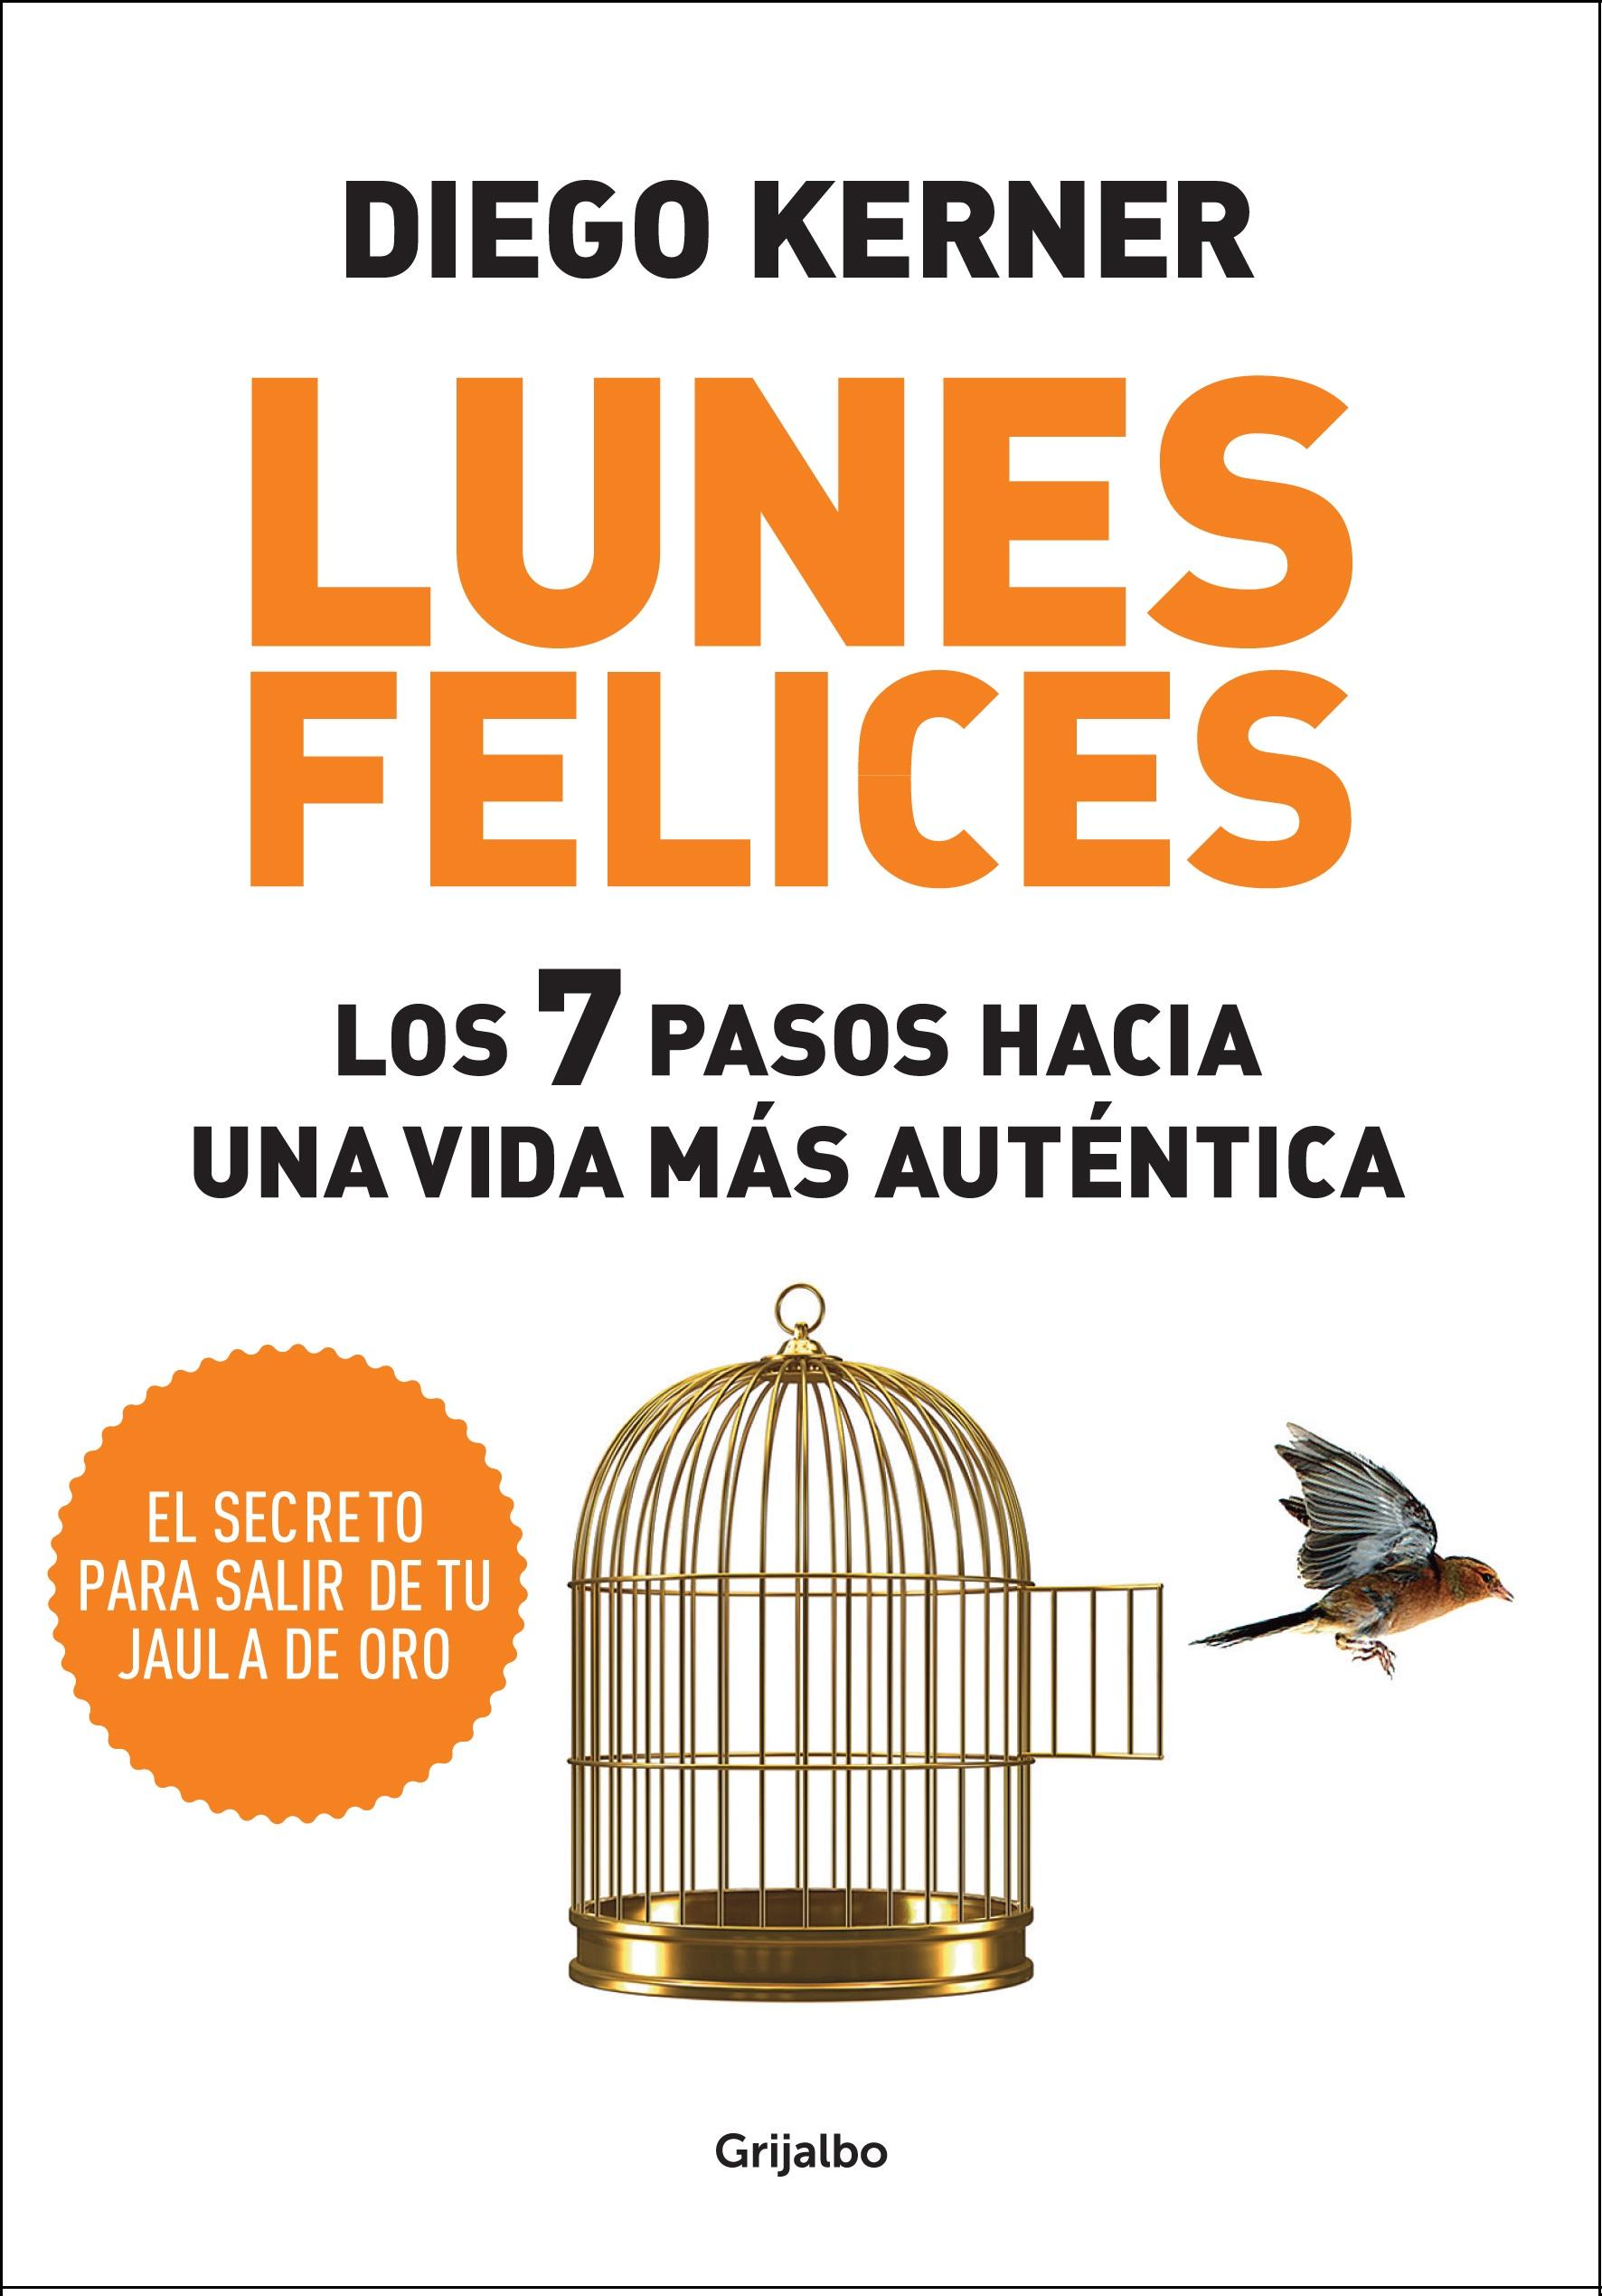 Lunes Felices Diego Kerner